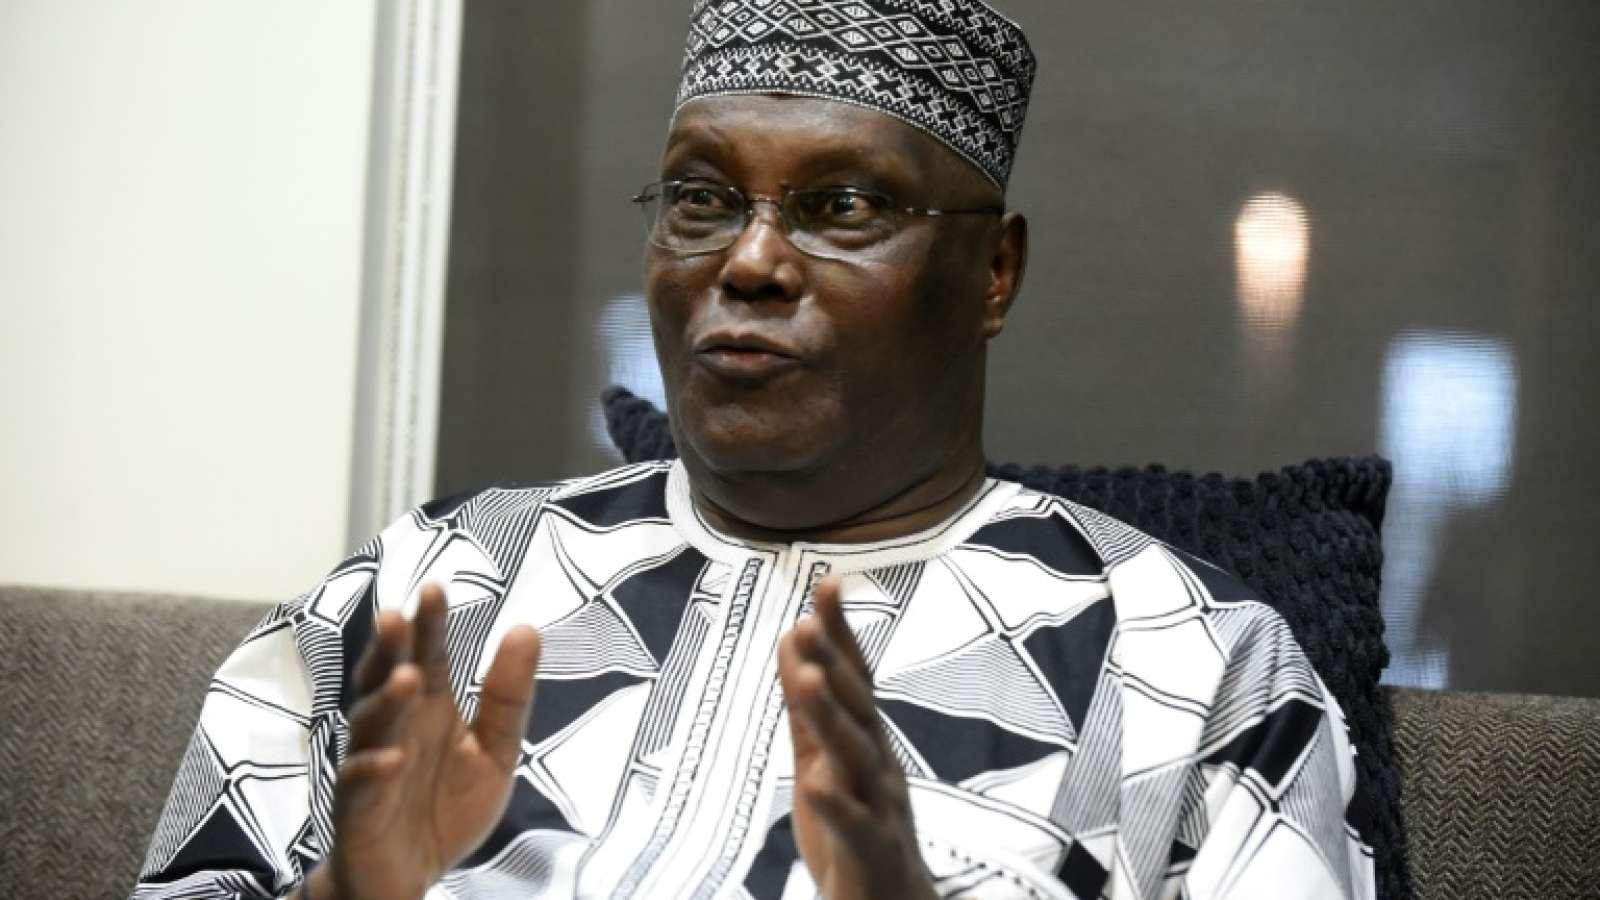 Zamfara abduction: Empower State to control Internal security – Atiku tells Buhari